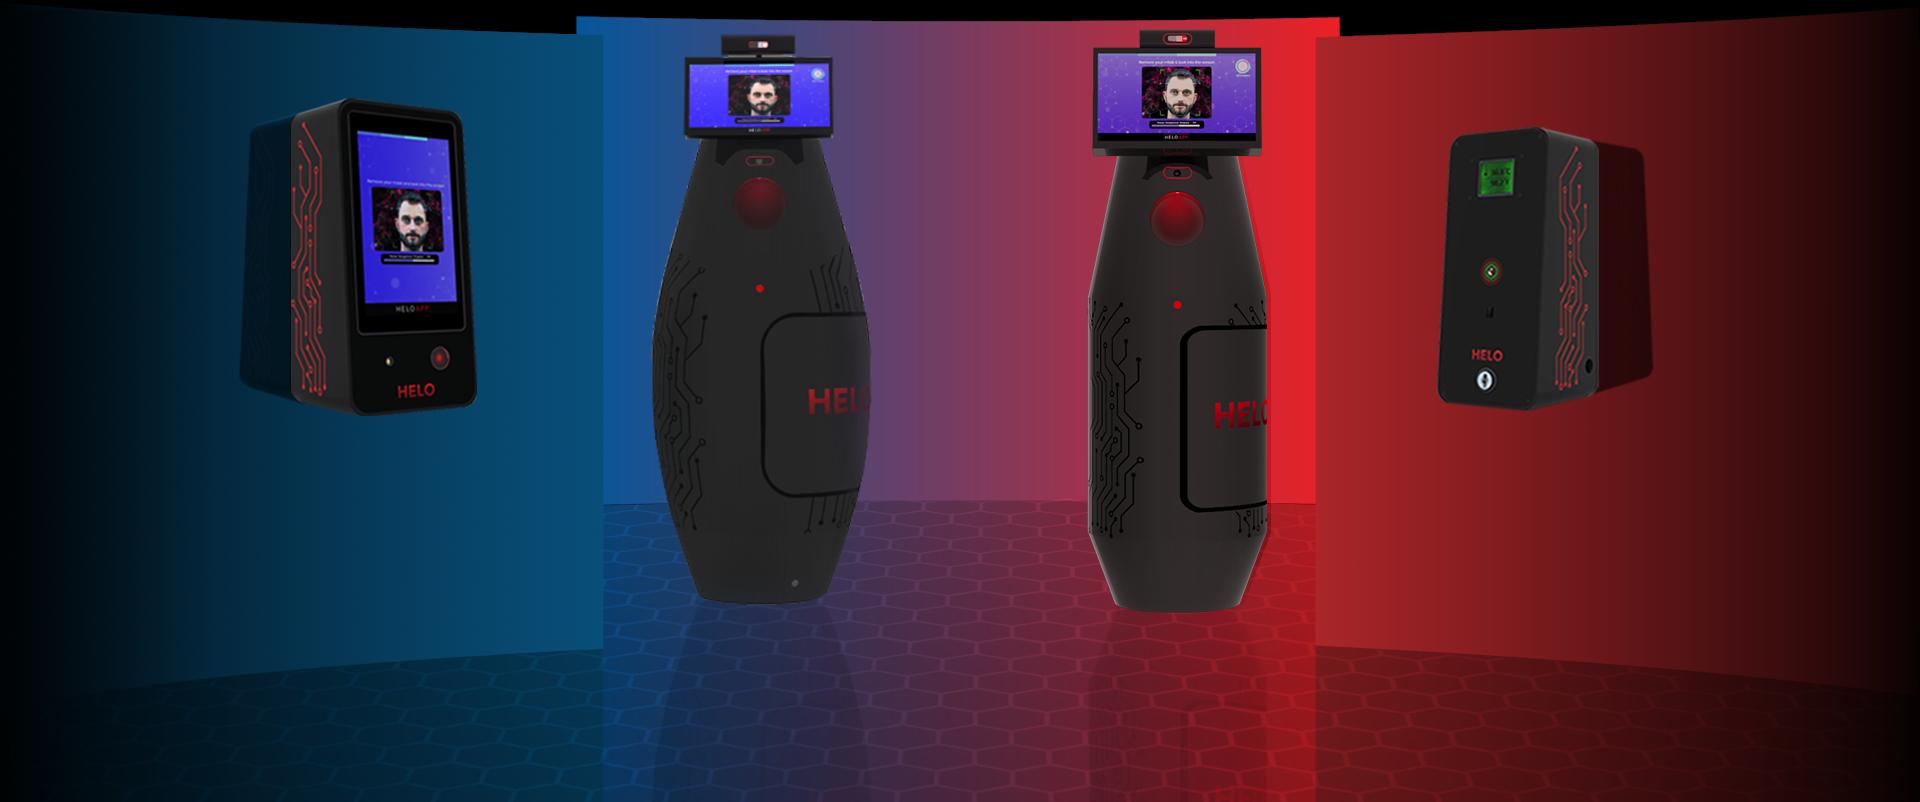 HeloHealth Image 3